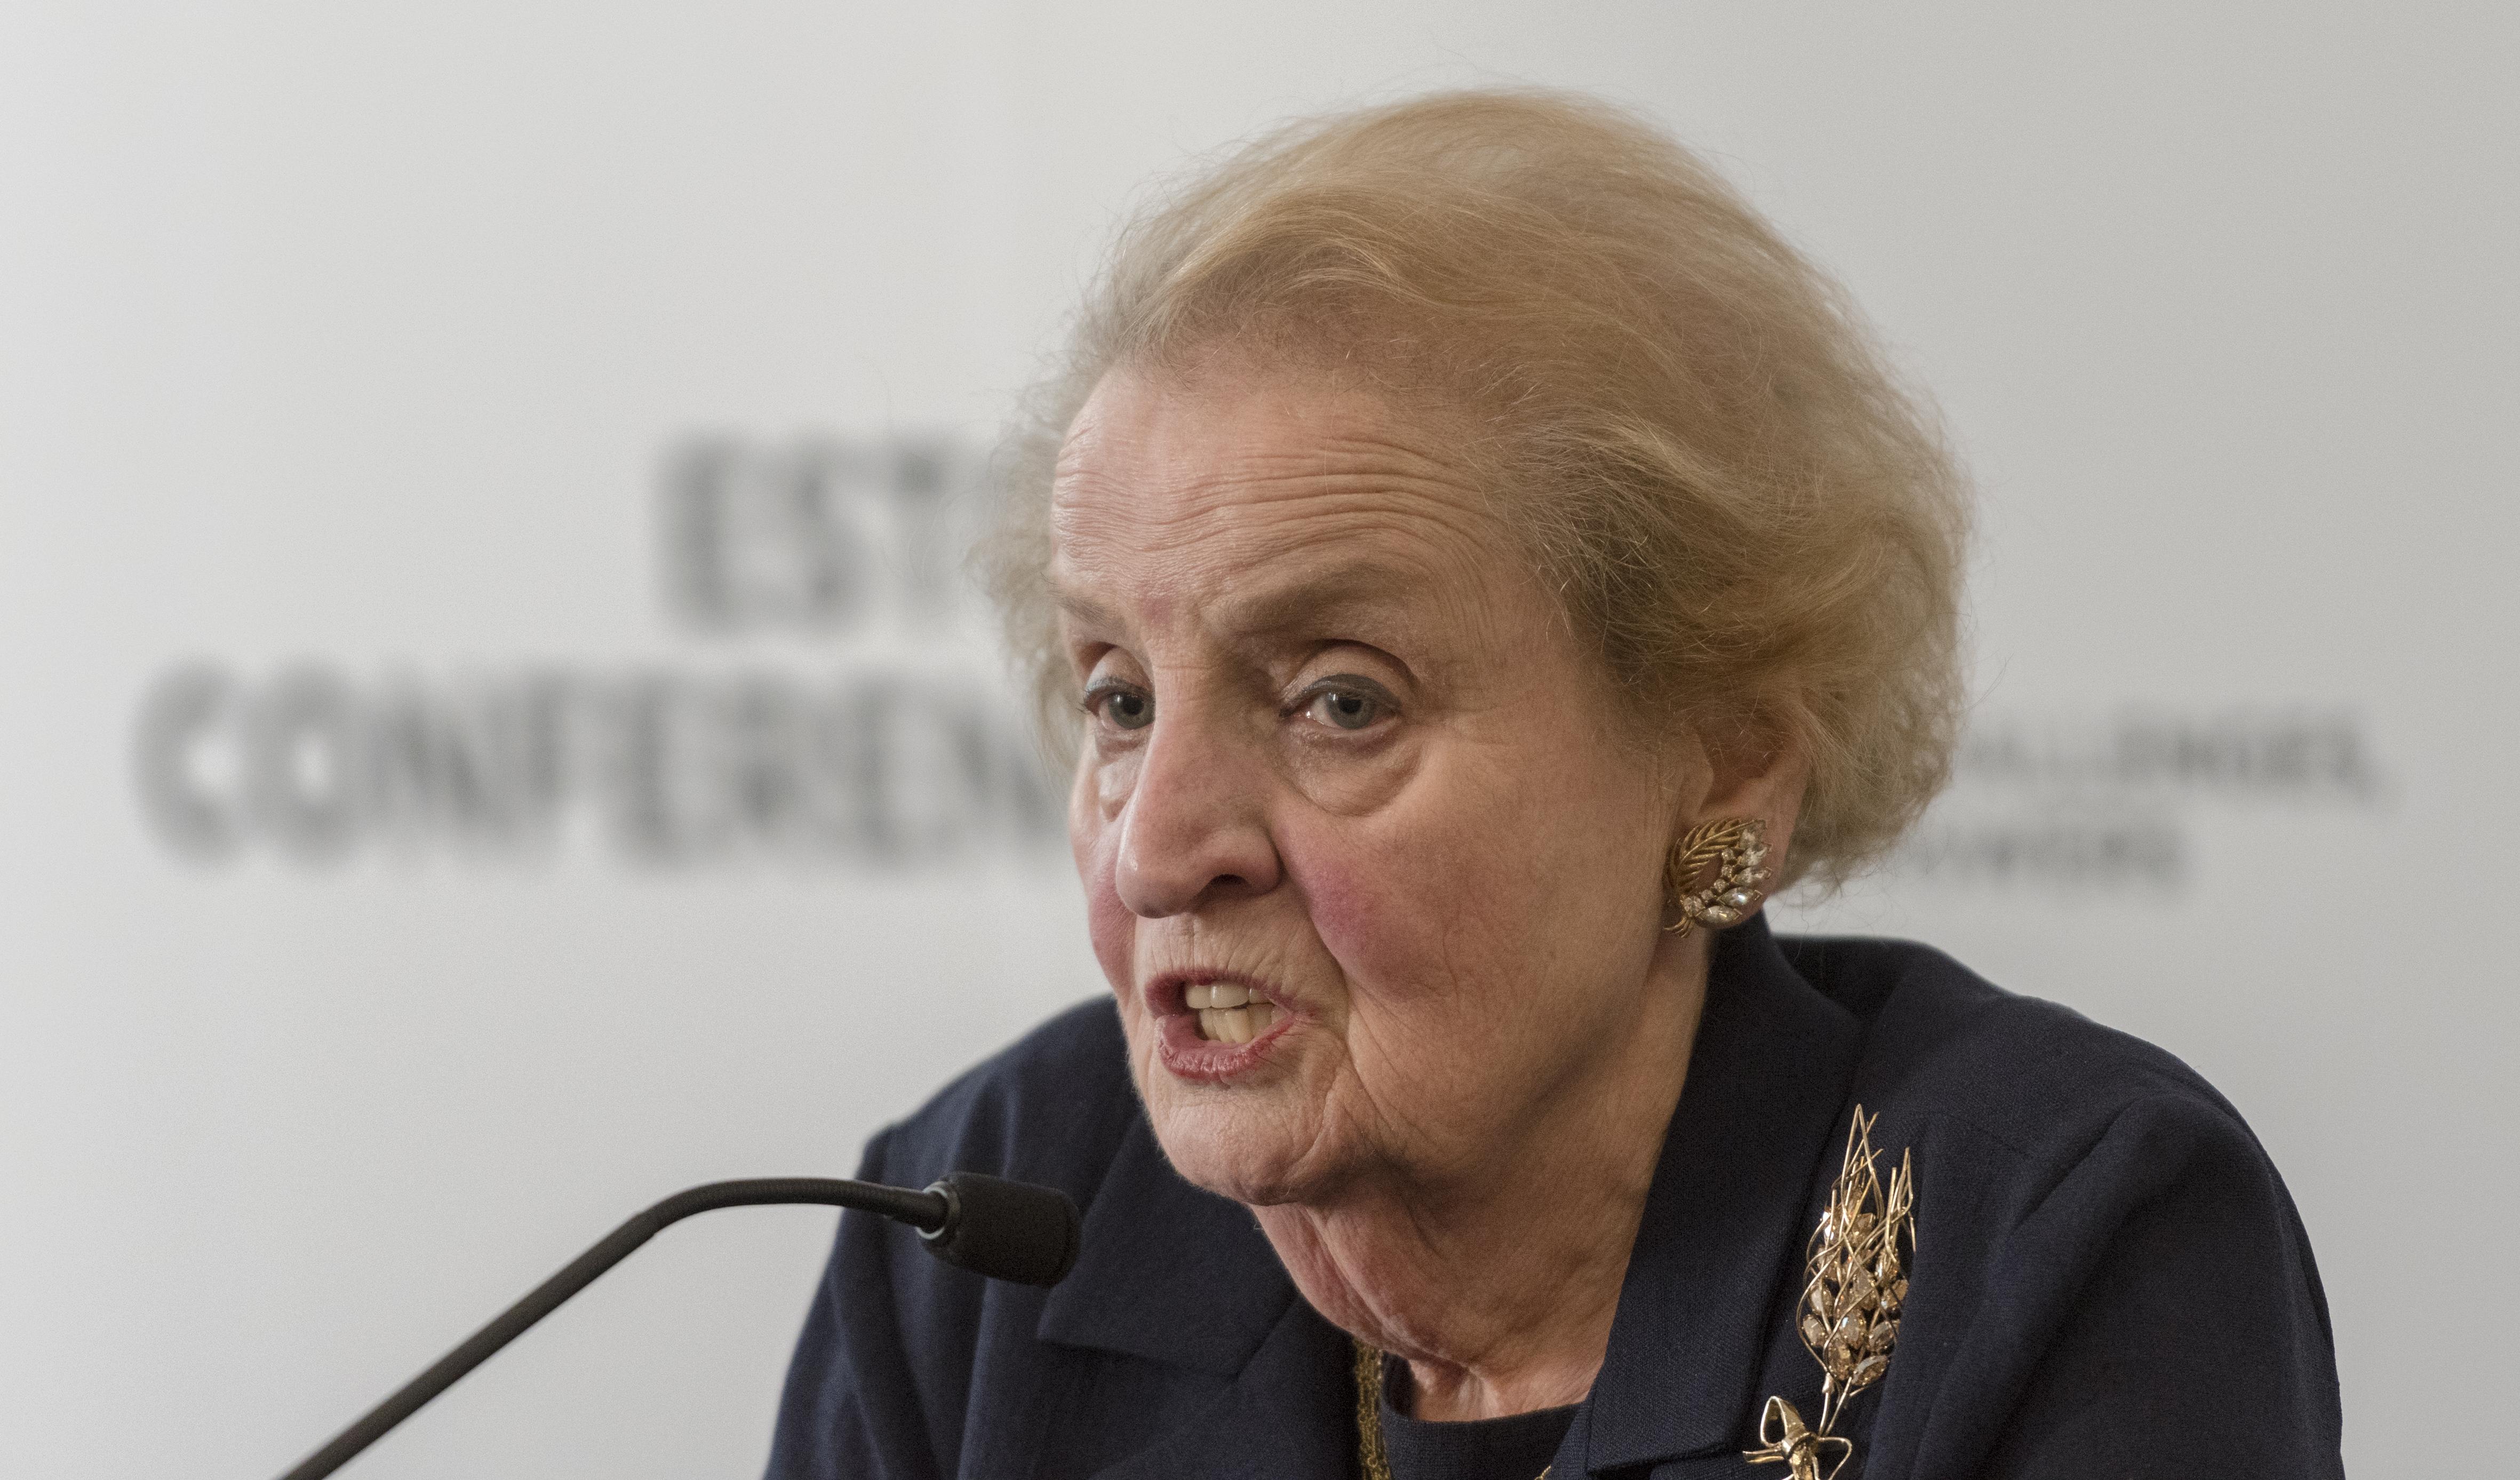 Former United States Secretary of State Madeleine Albright at Estoril Conferences 2017